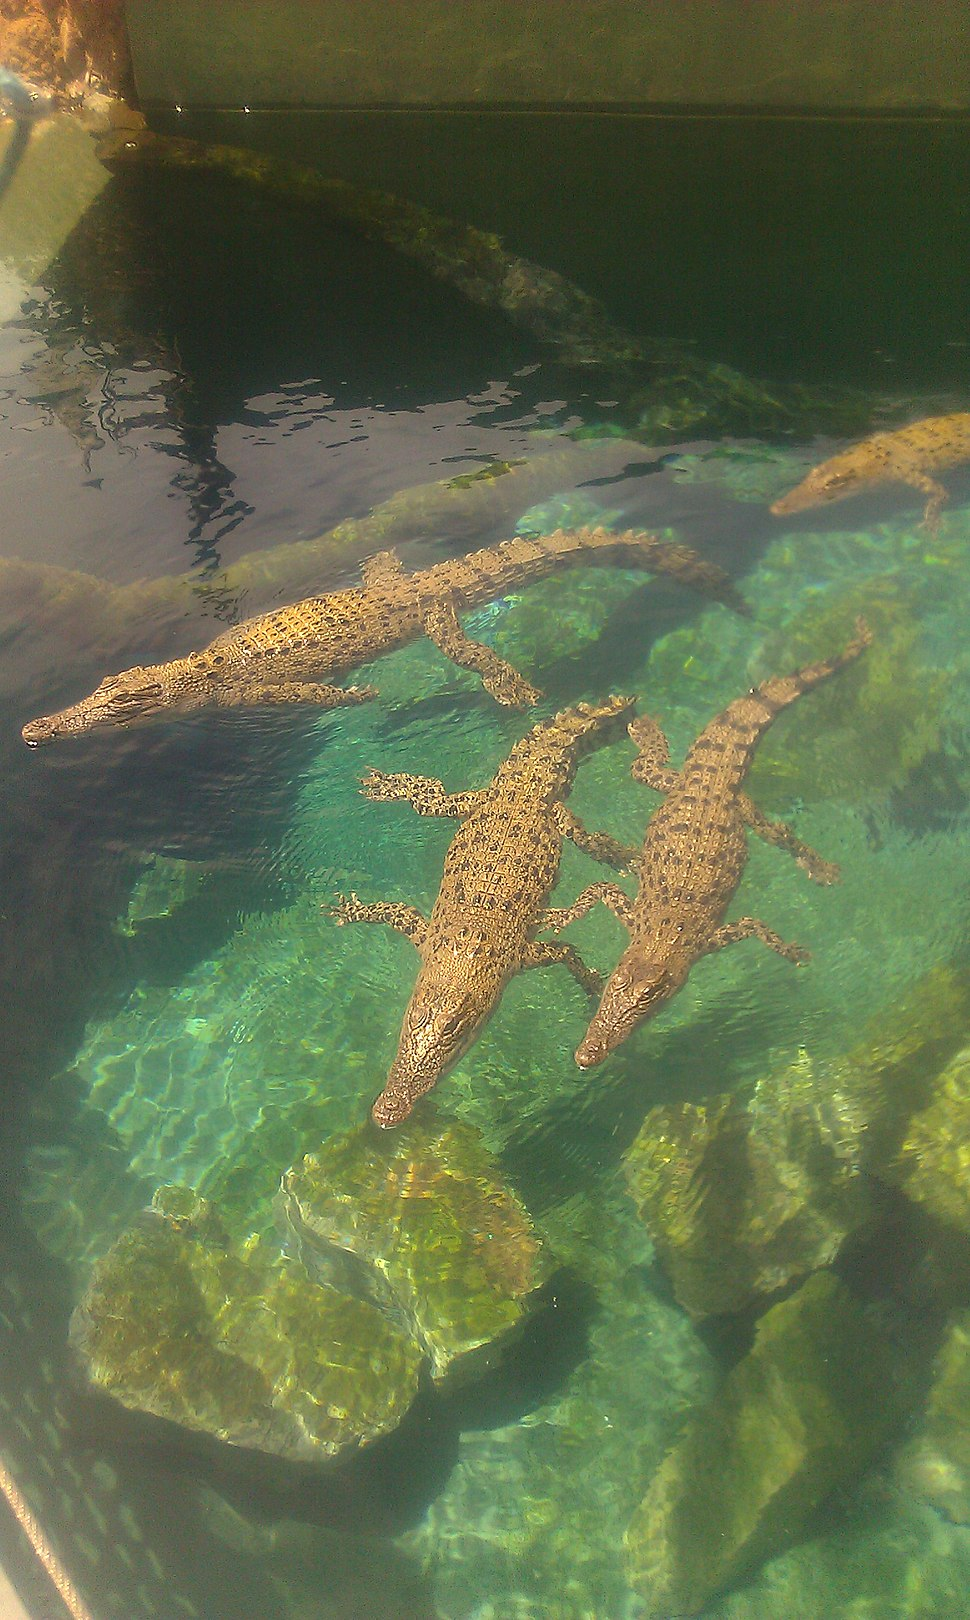 Young saltwater crocodiles at Crocosaurus Cove, Darwin, Australia, 02